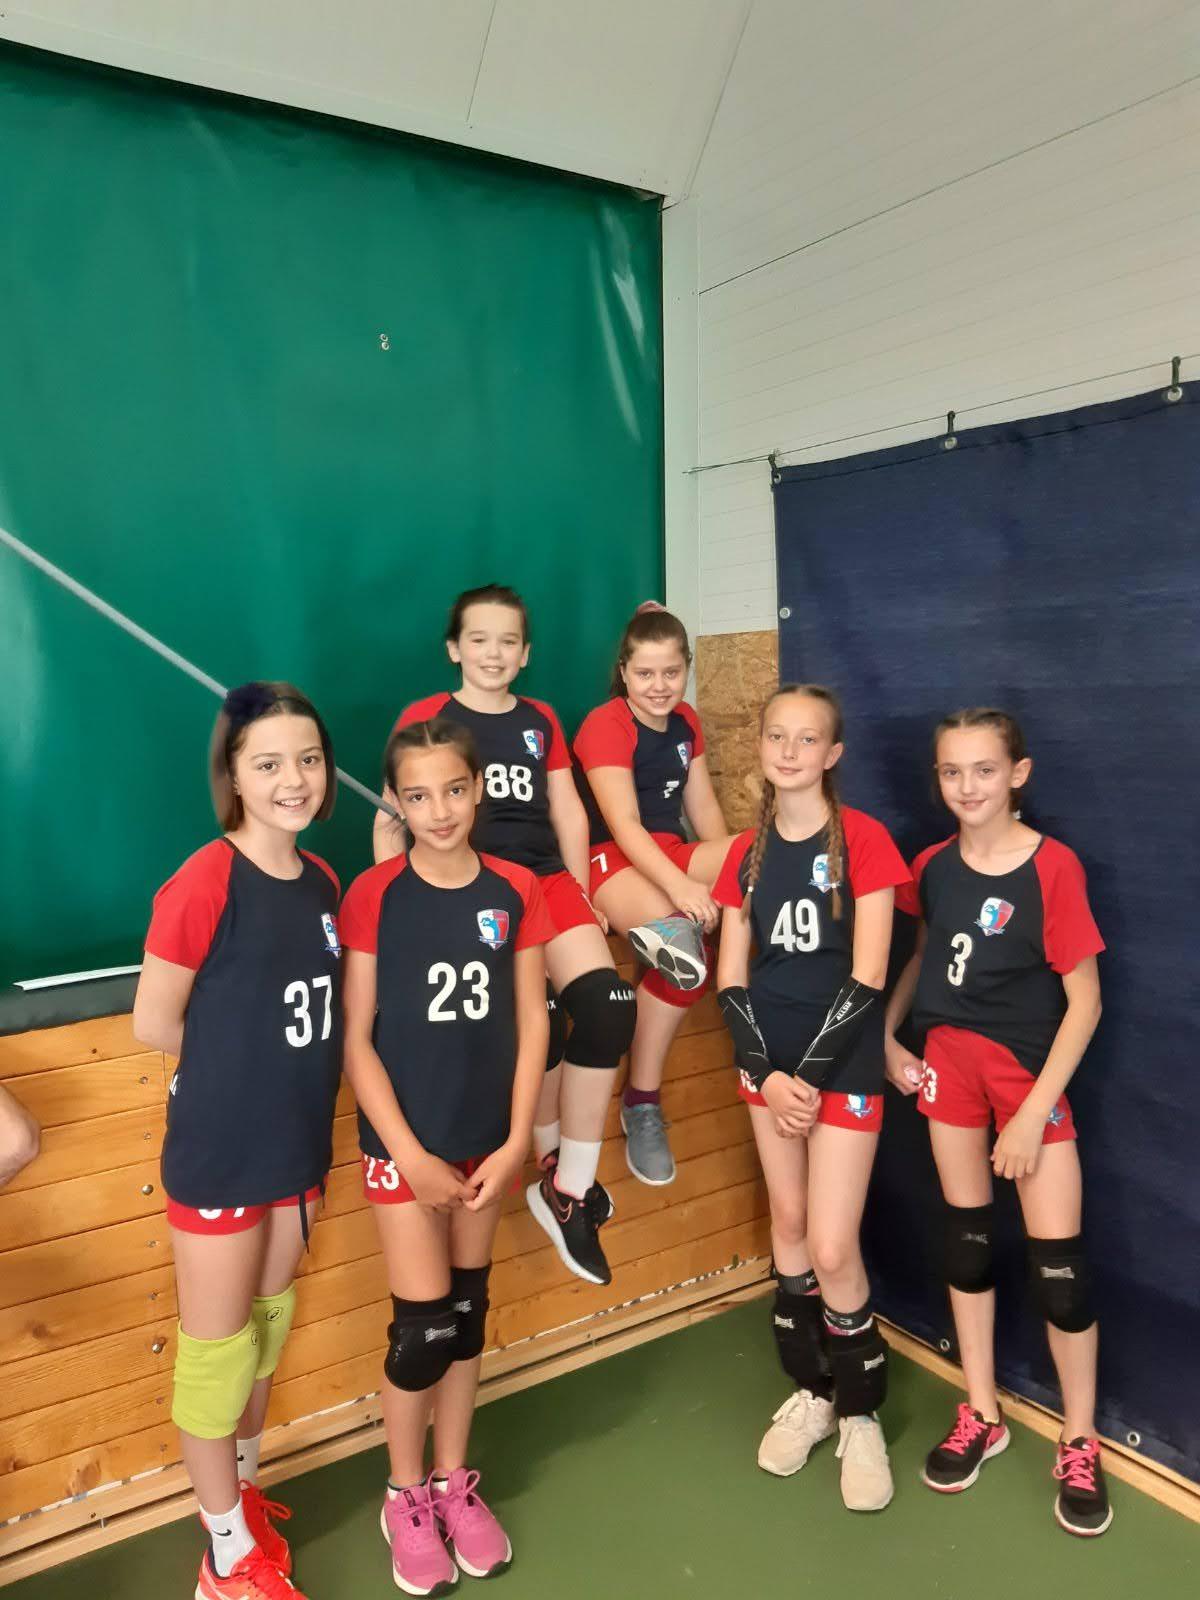 Druženje | Mini Volley liga | III - IV kolo | sezona | 2020/2021 - 3